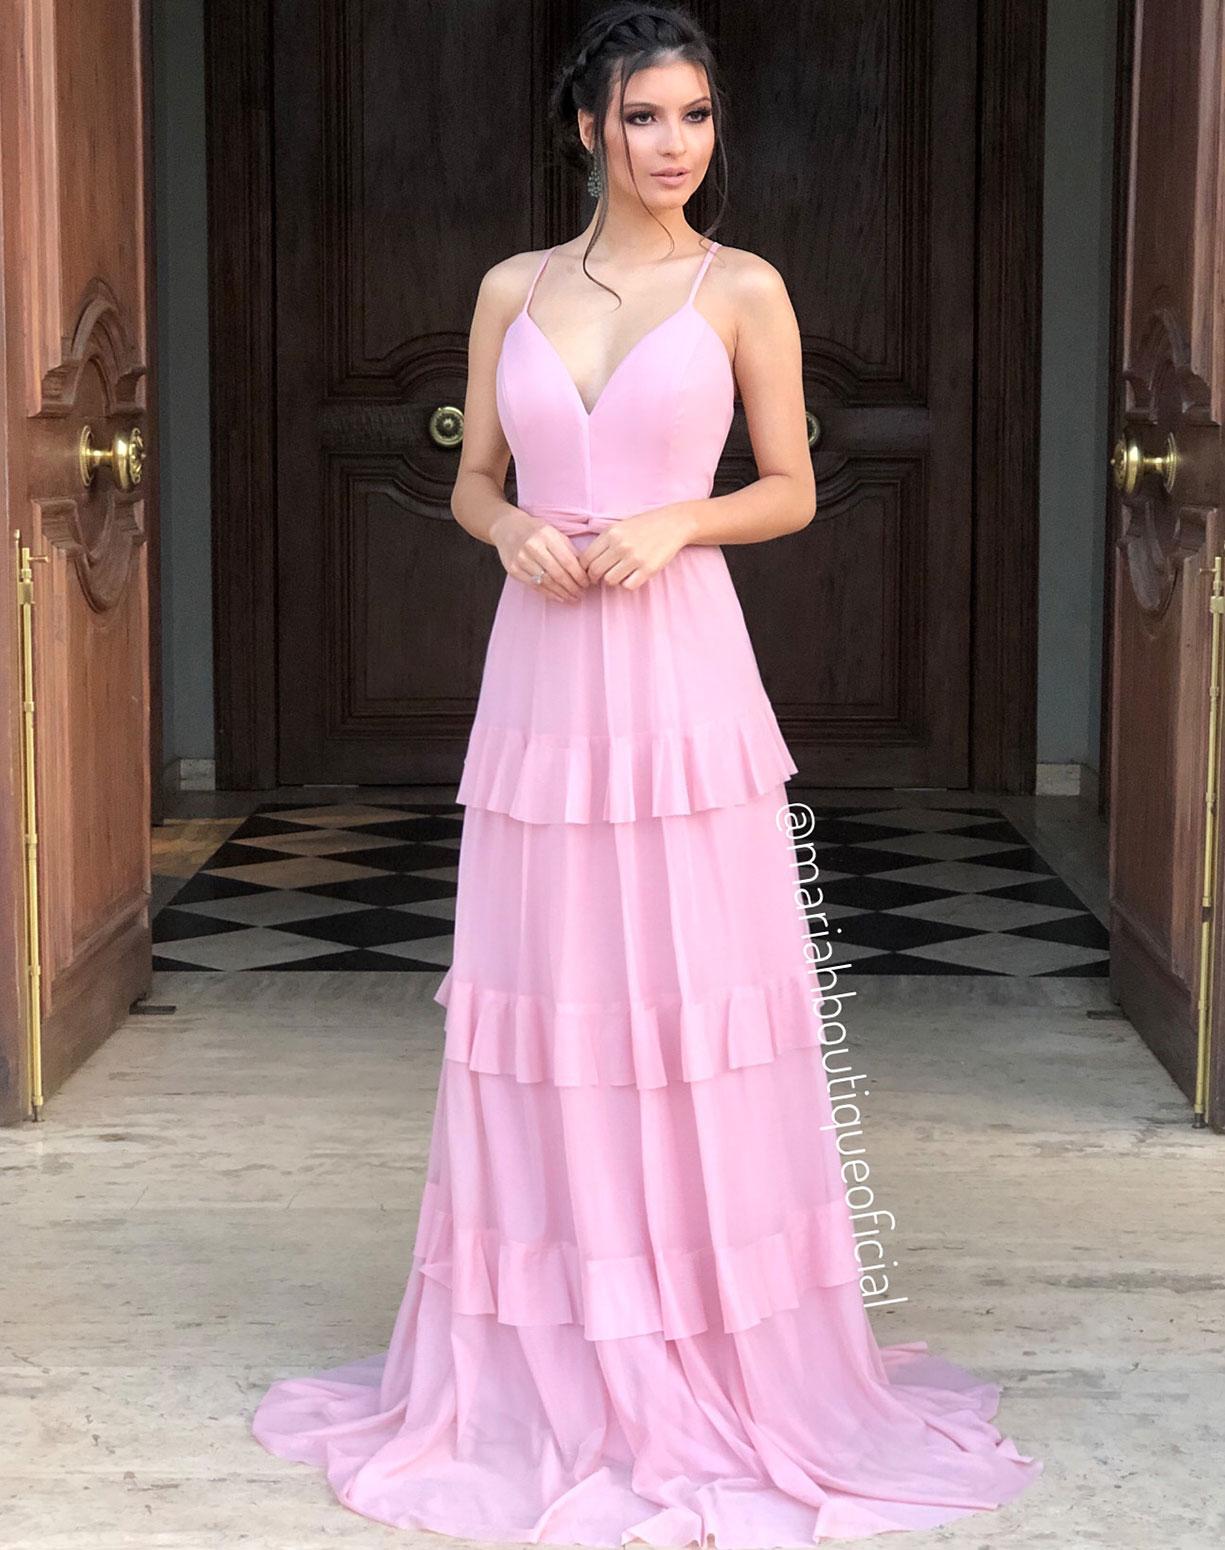 Vestido Rose em Camadas de Tule